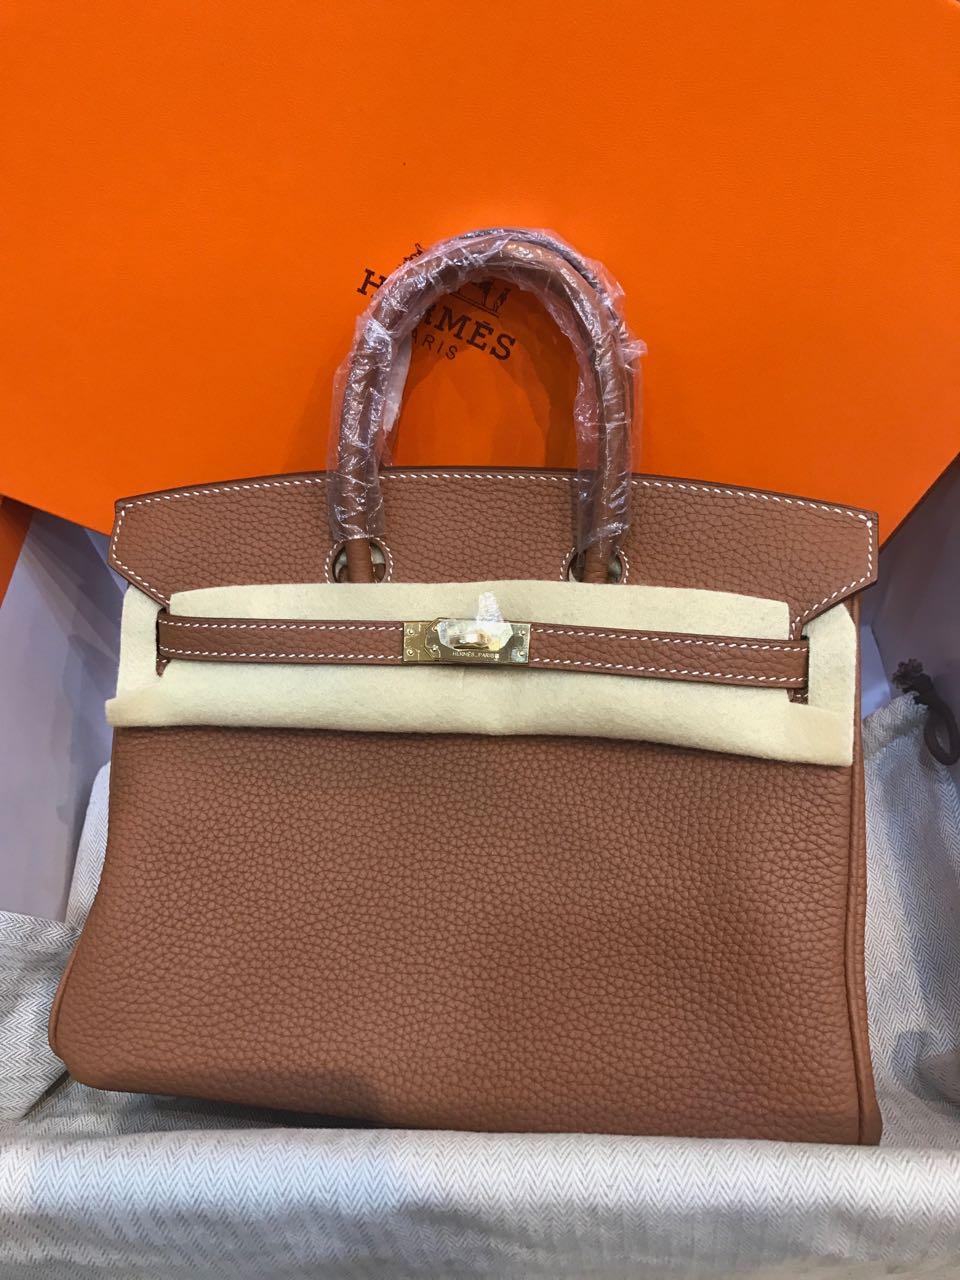 Code  Hermes Birkin B25Cm Togo GHW and PHW Mirror Original Leather Bag ff48bf23d1